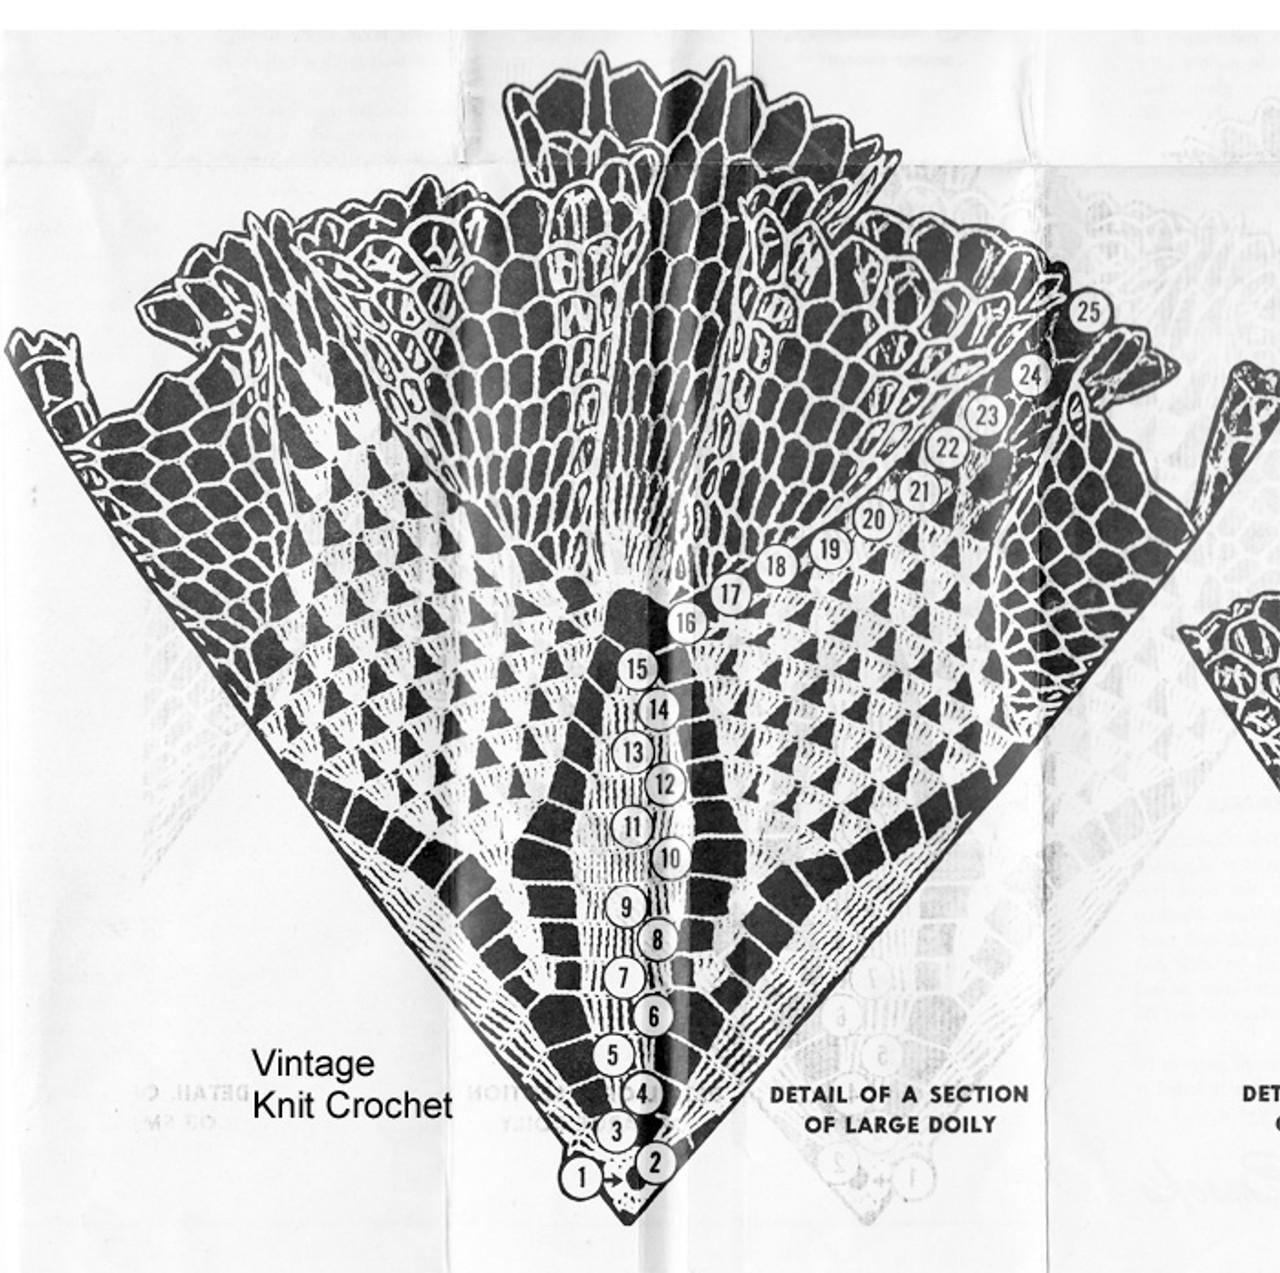 Large ruffled doily illustration for Design 7049